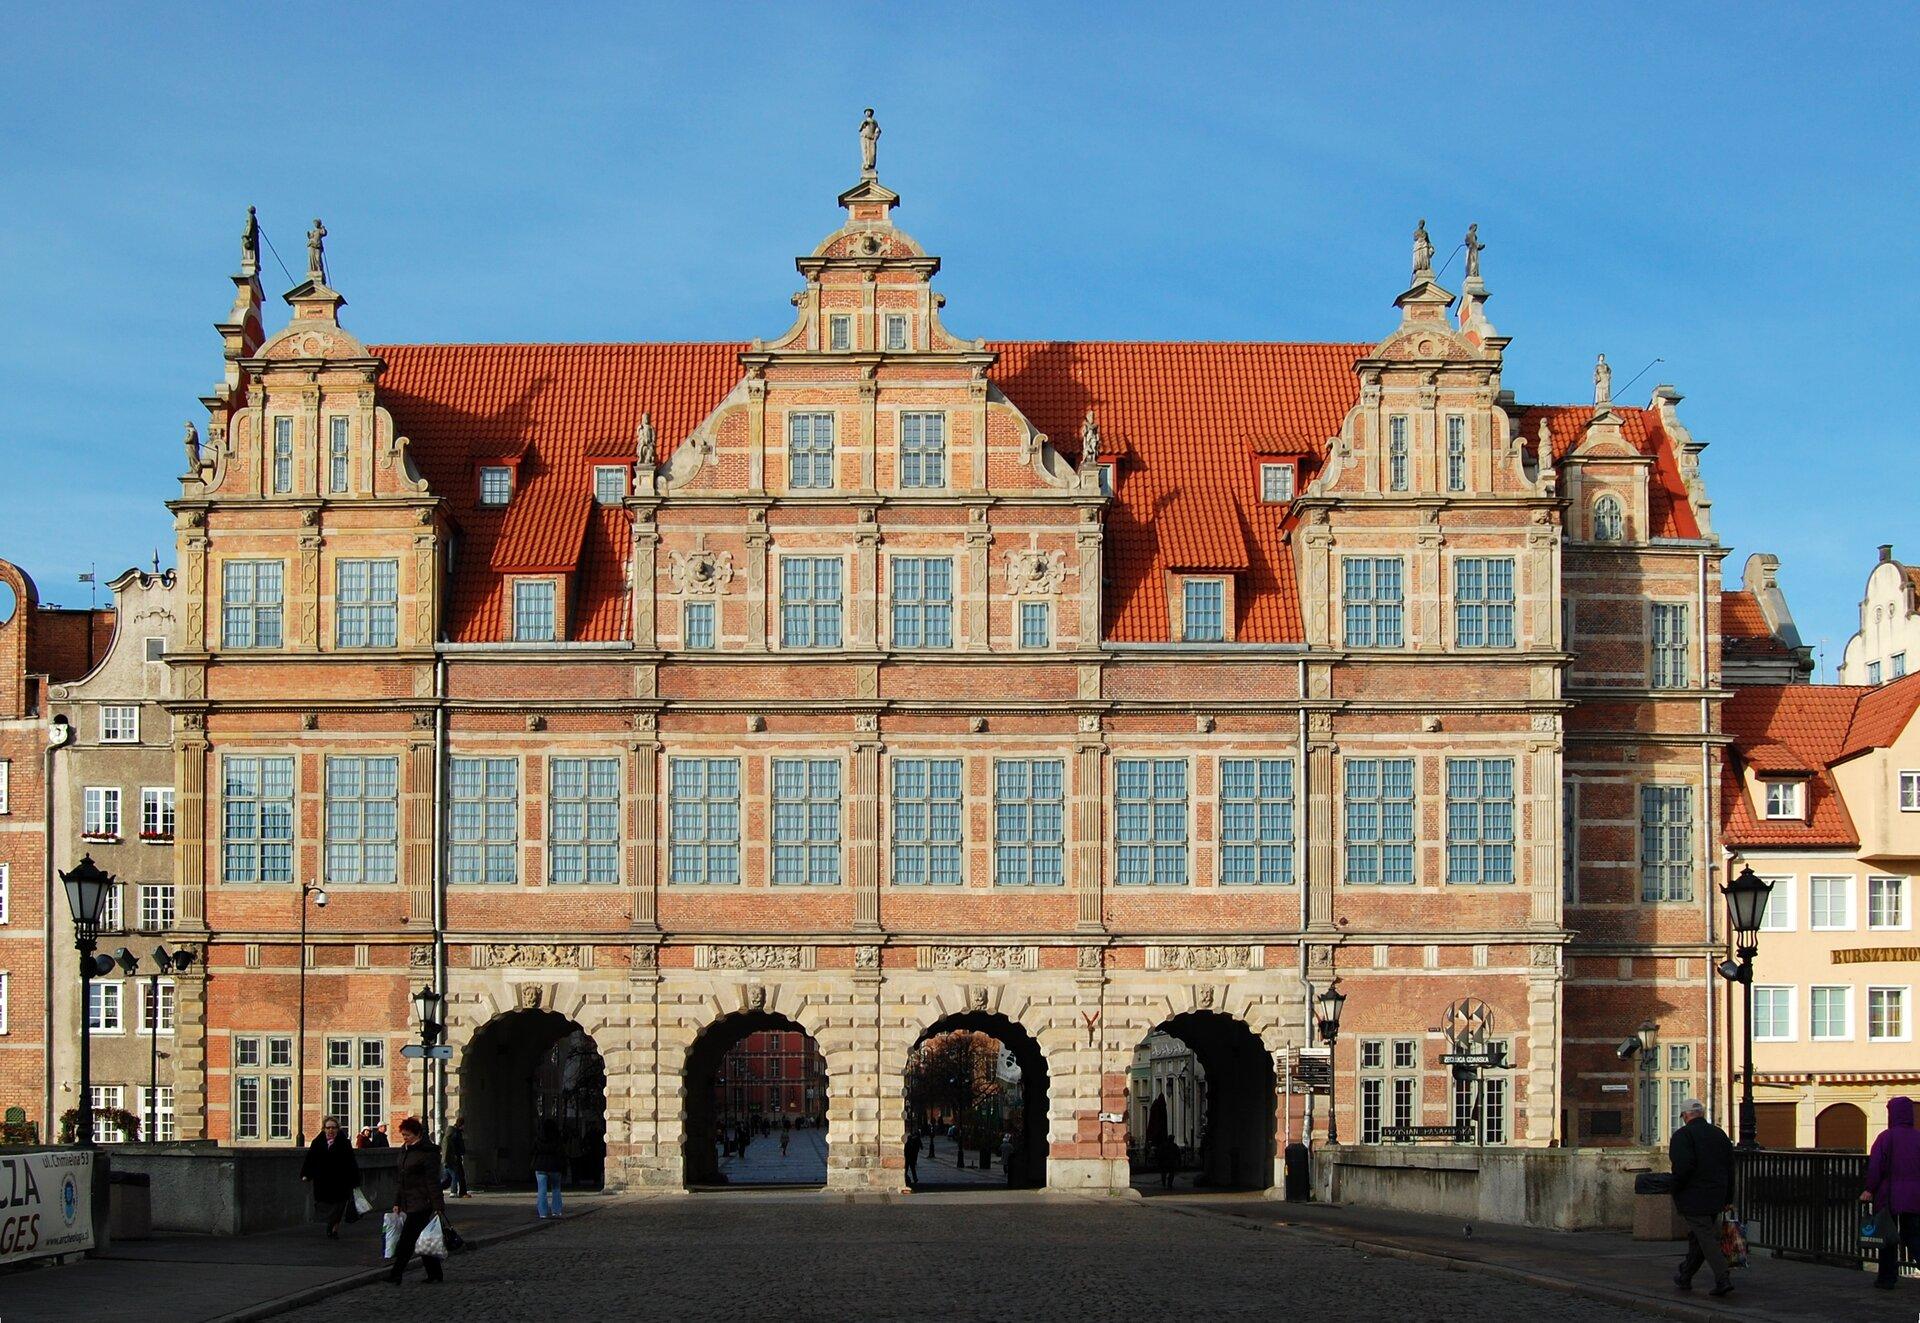 Gdańsk -Brama Zielona Gdańsk -Brama Zielona Źródło: Marcin Białek, Wikimedia Commons, licencja: CC BY-SA 4.0.